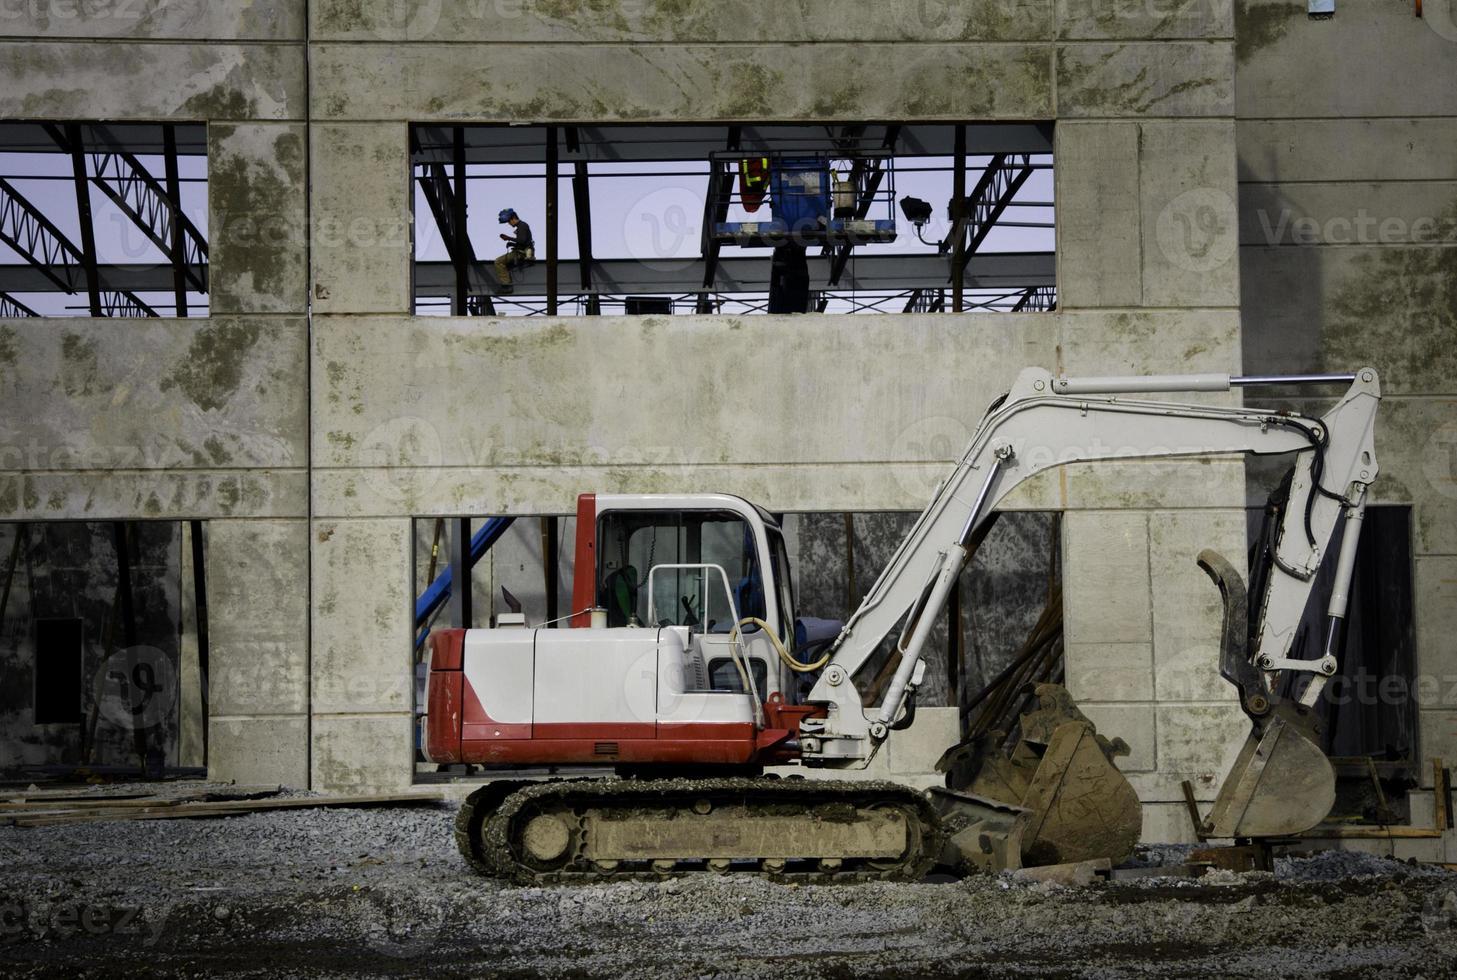 Parked Excavator photo